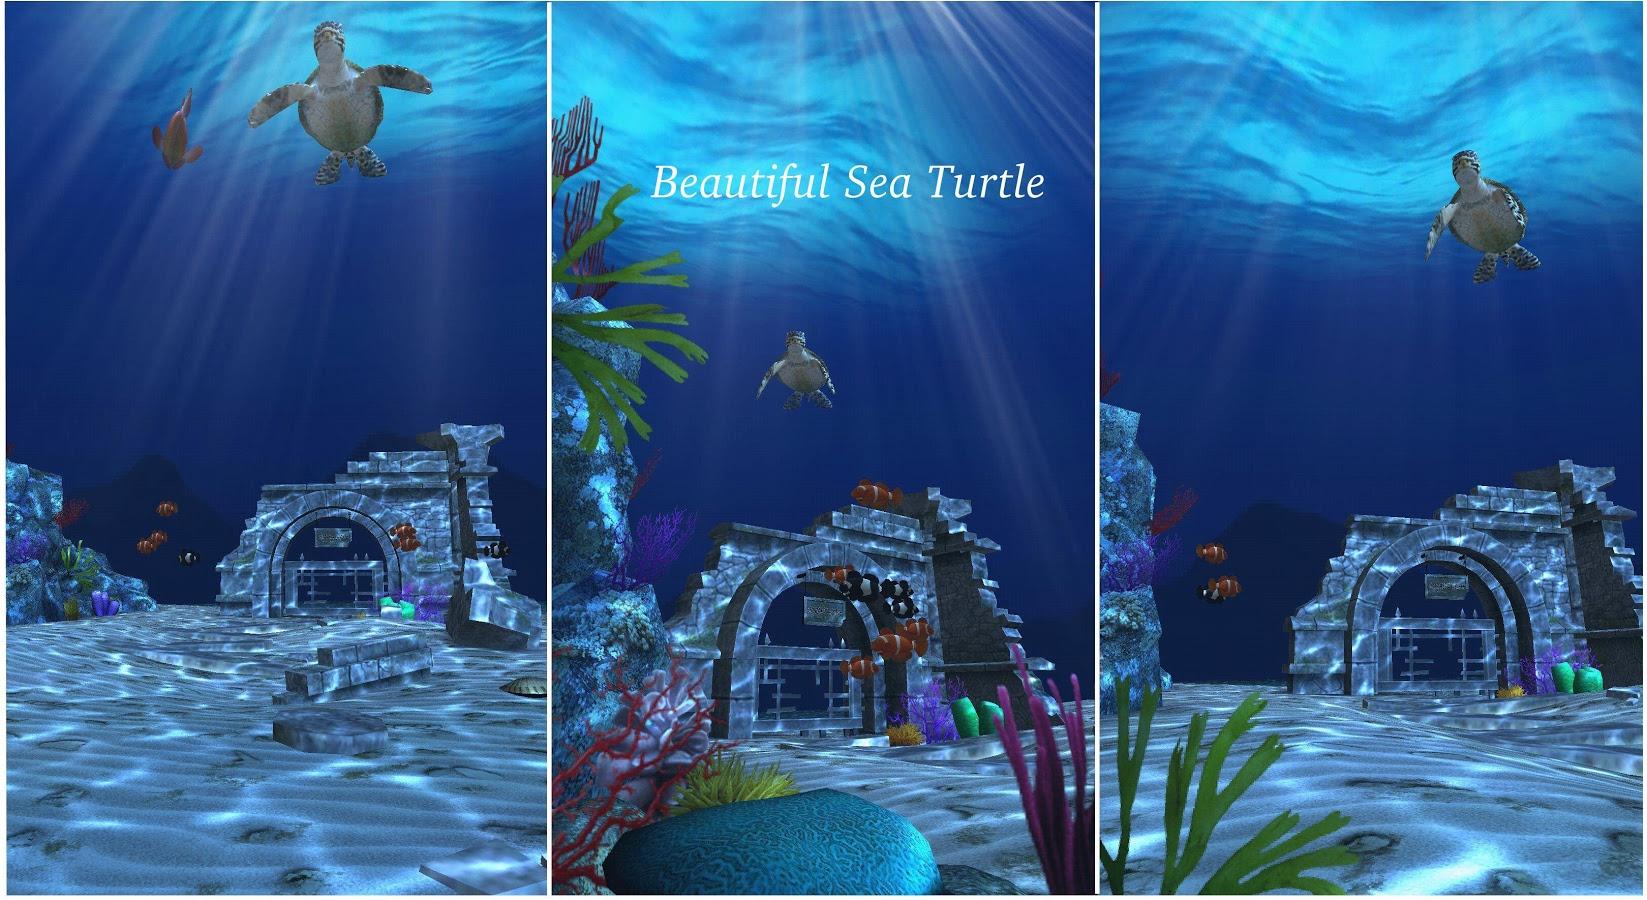 Free Download Ocean 3d Live Wallpaper Is A Very Vivid